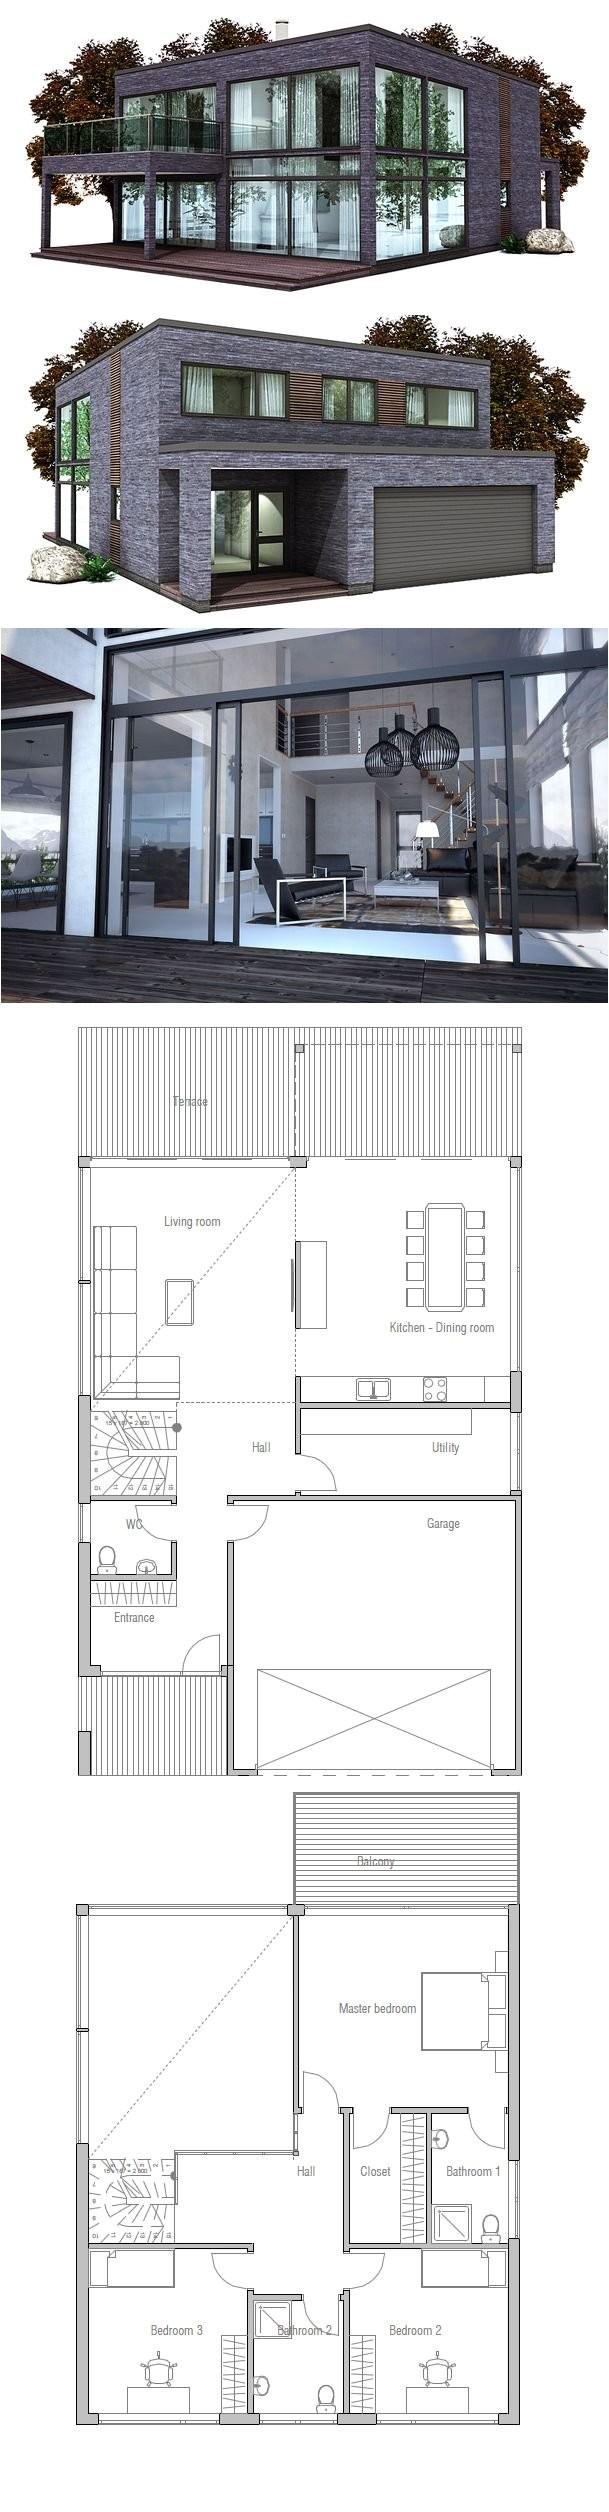 simple box house plans